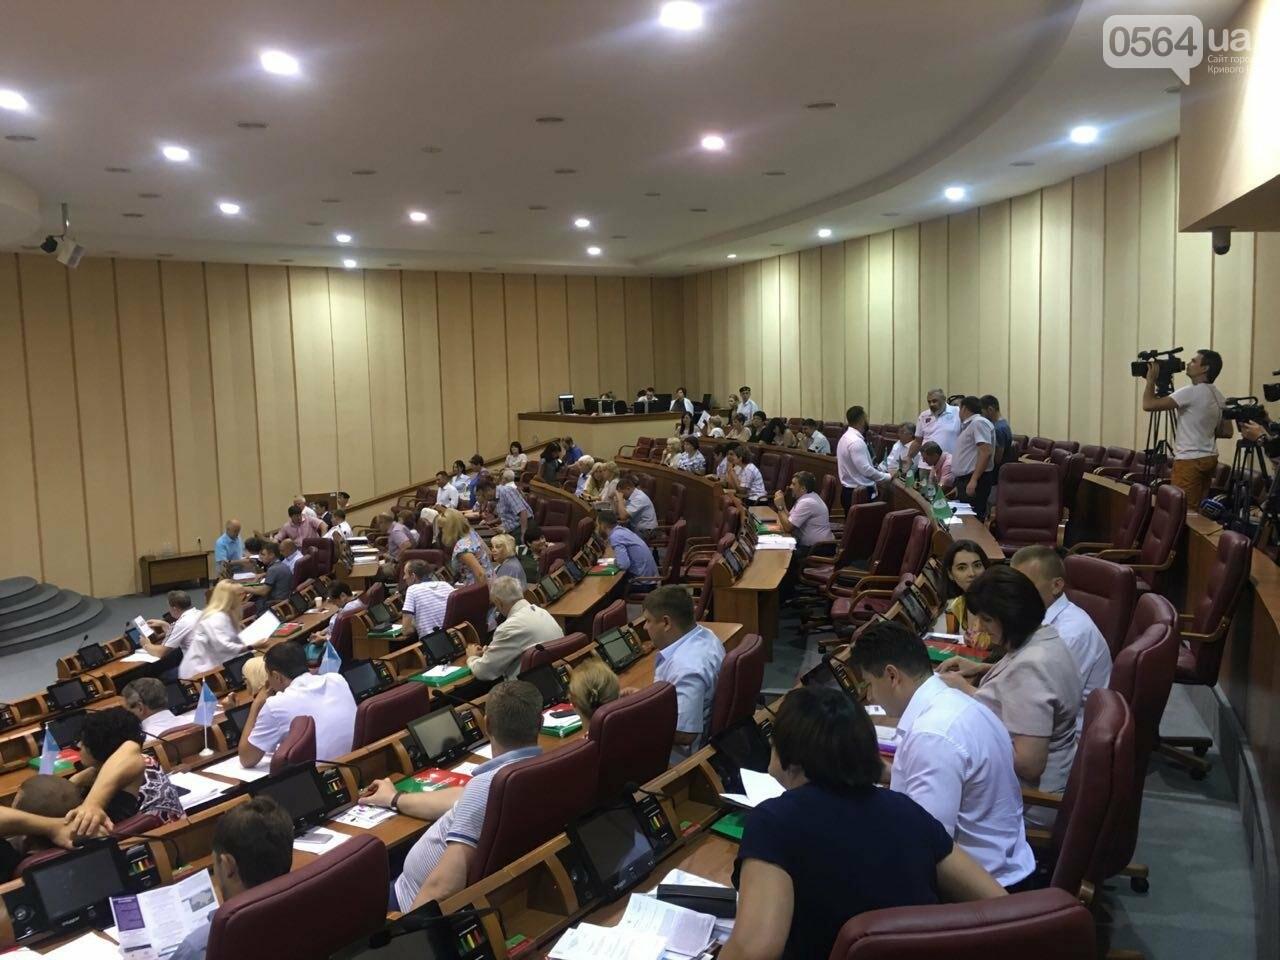 Криворожский горсовет не поддержал петицию о запрете Марша равенства, - ФОТО, фото-12